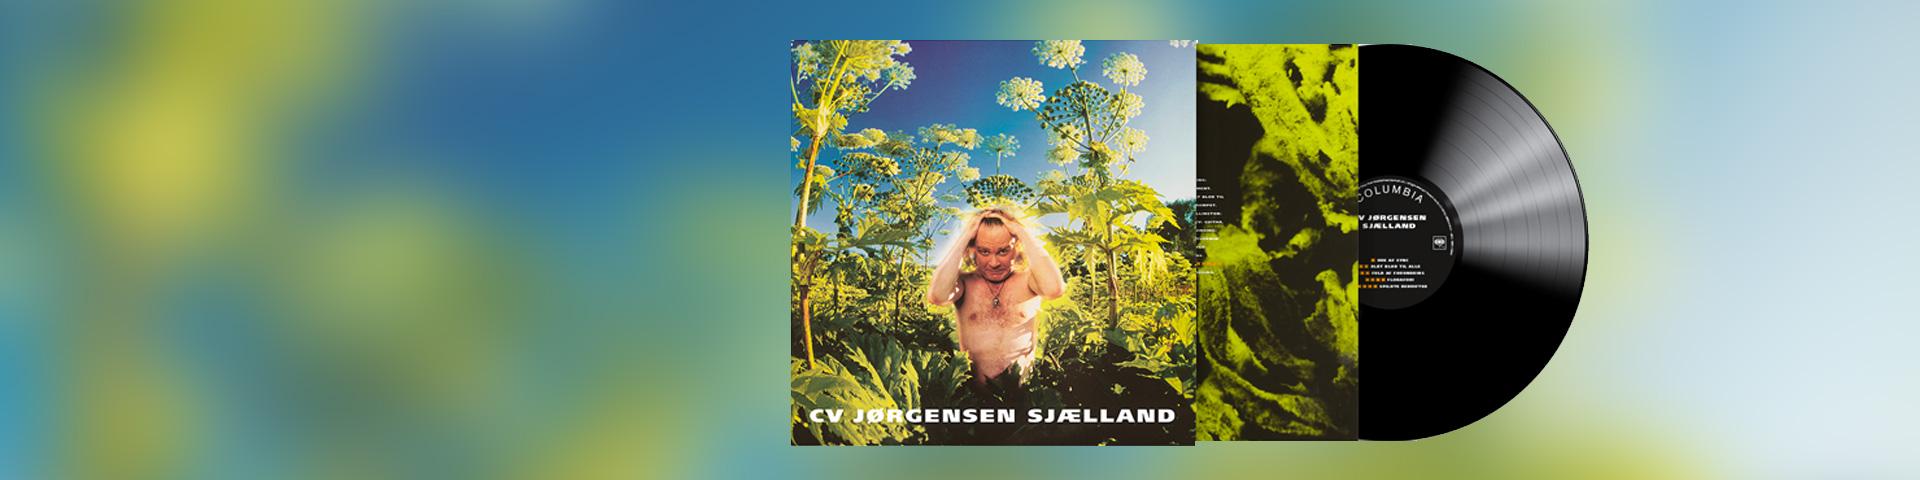 CV Jørgensen - Sjælland vinyl